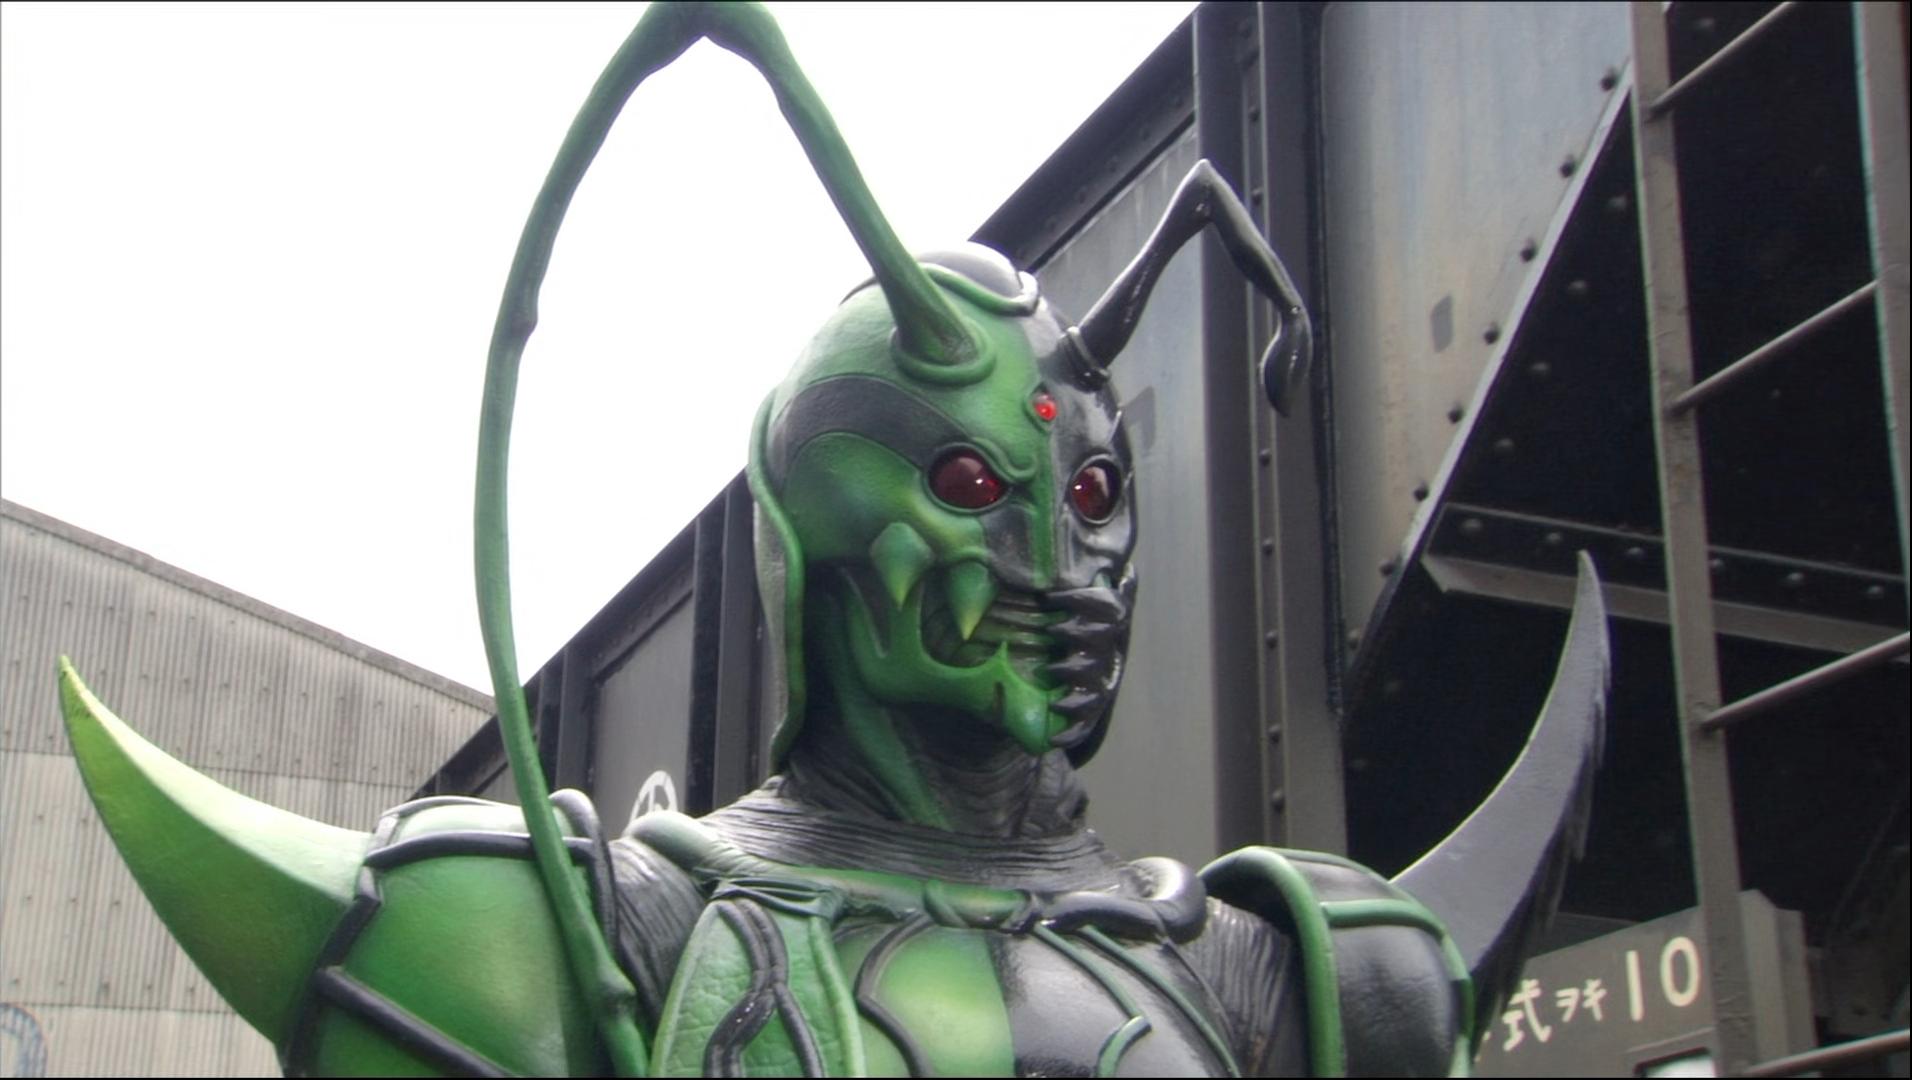 Anthopper Imagin Ari